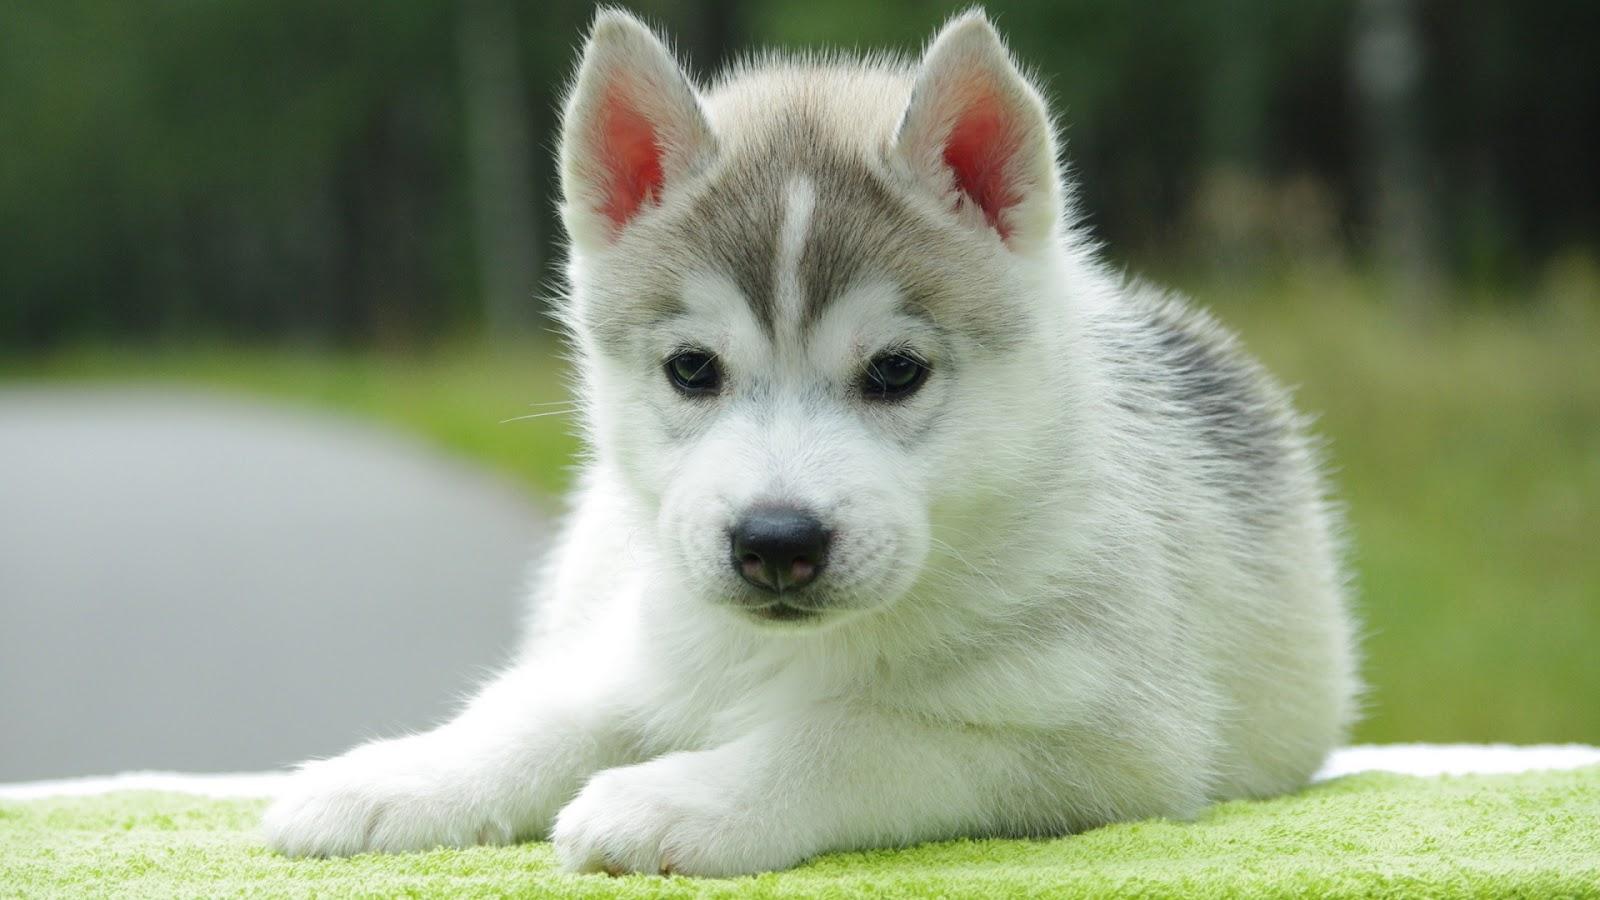 Cute White Puppy Husky | Full HD Desktop Wallpapers 1080p